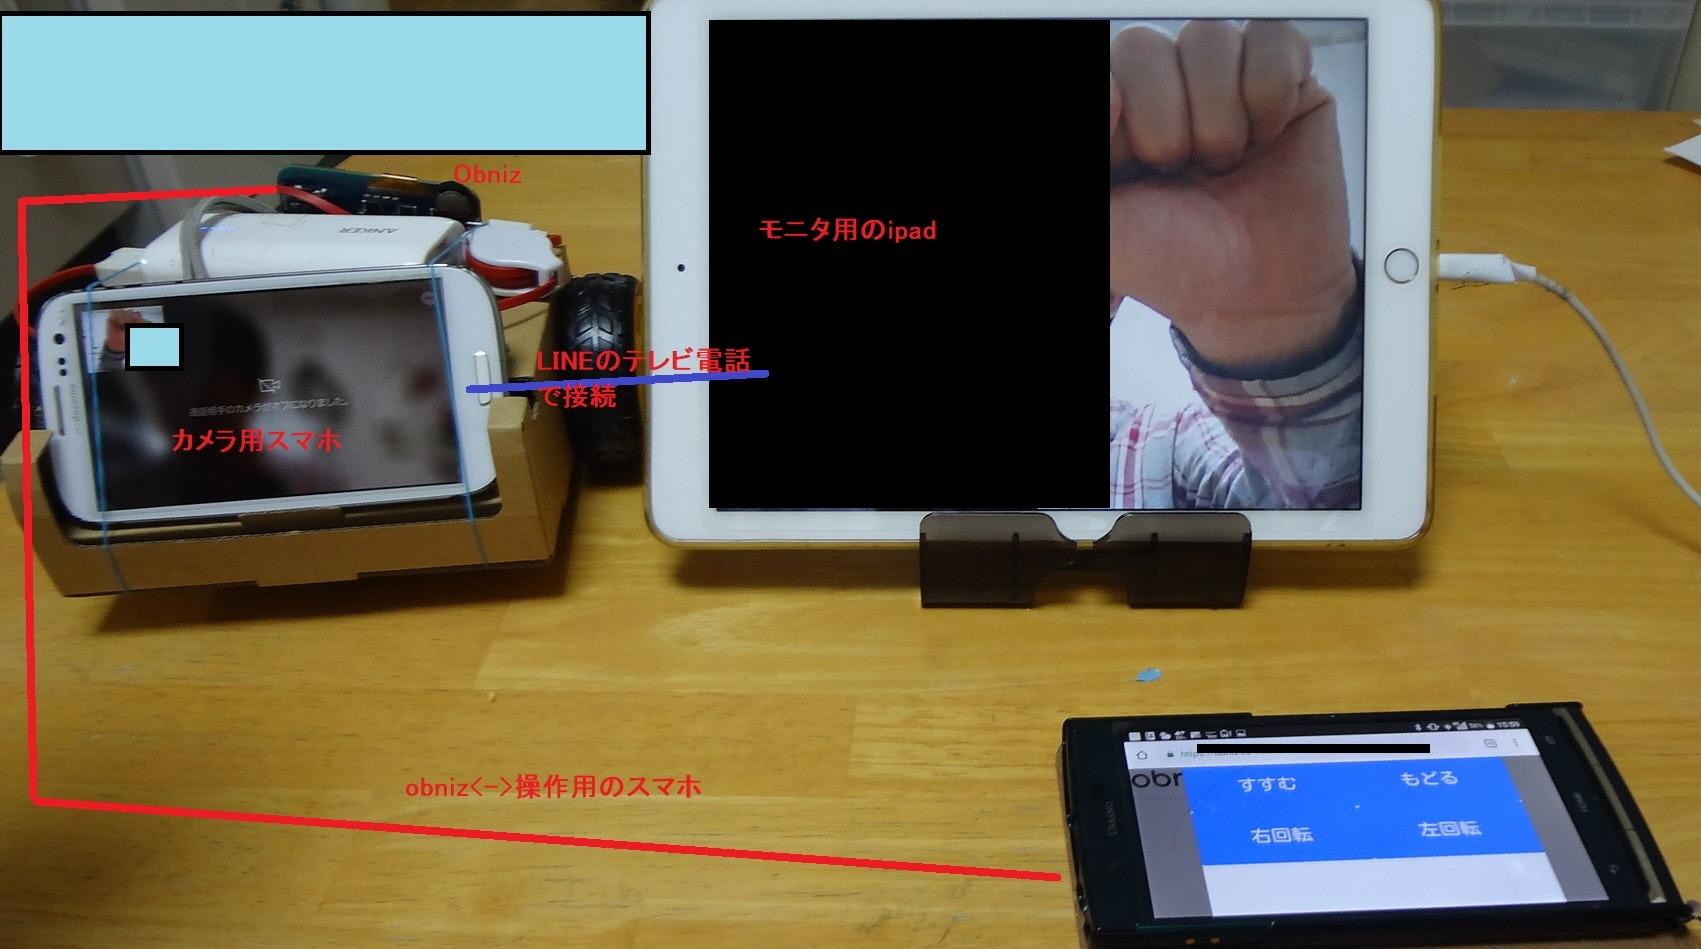 DSC03250説明付き.jpg